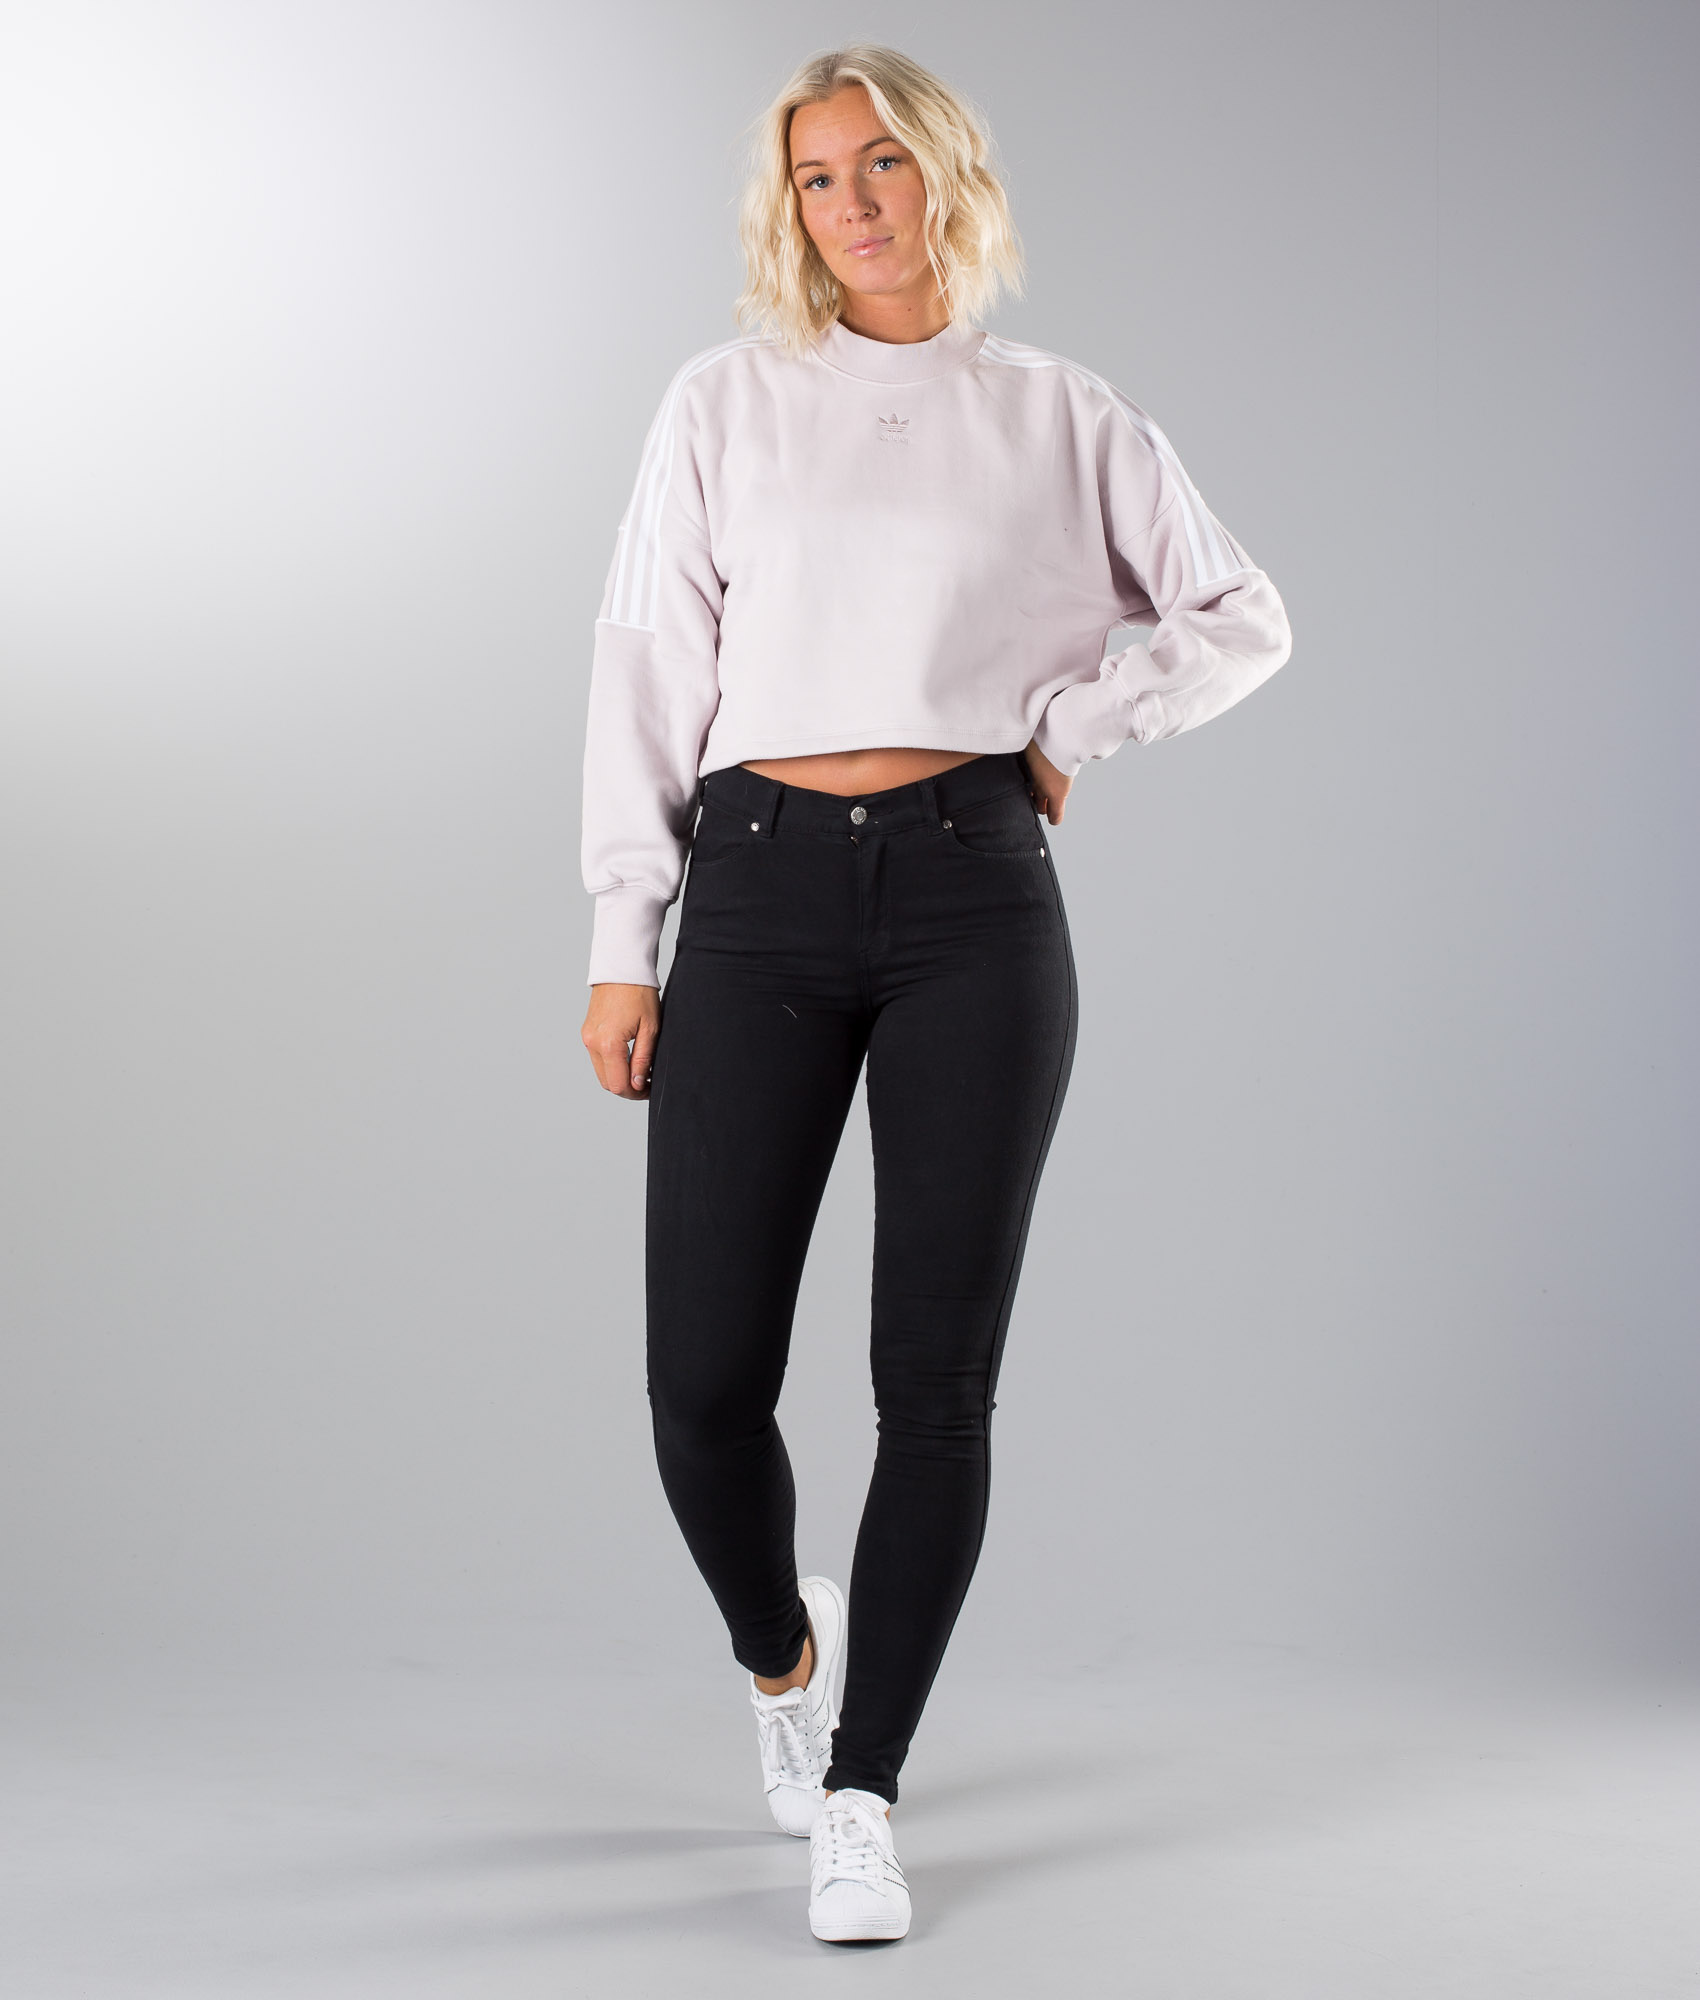 Adidas Originals Sweatshirt Gensere Ice Purple Ridestore.no